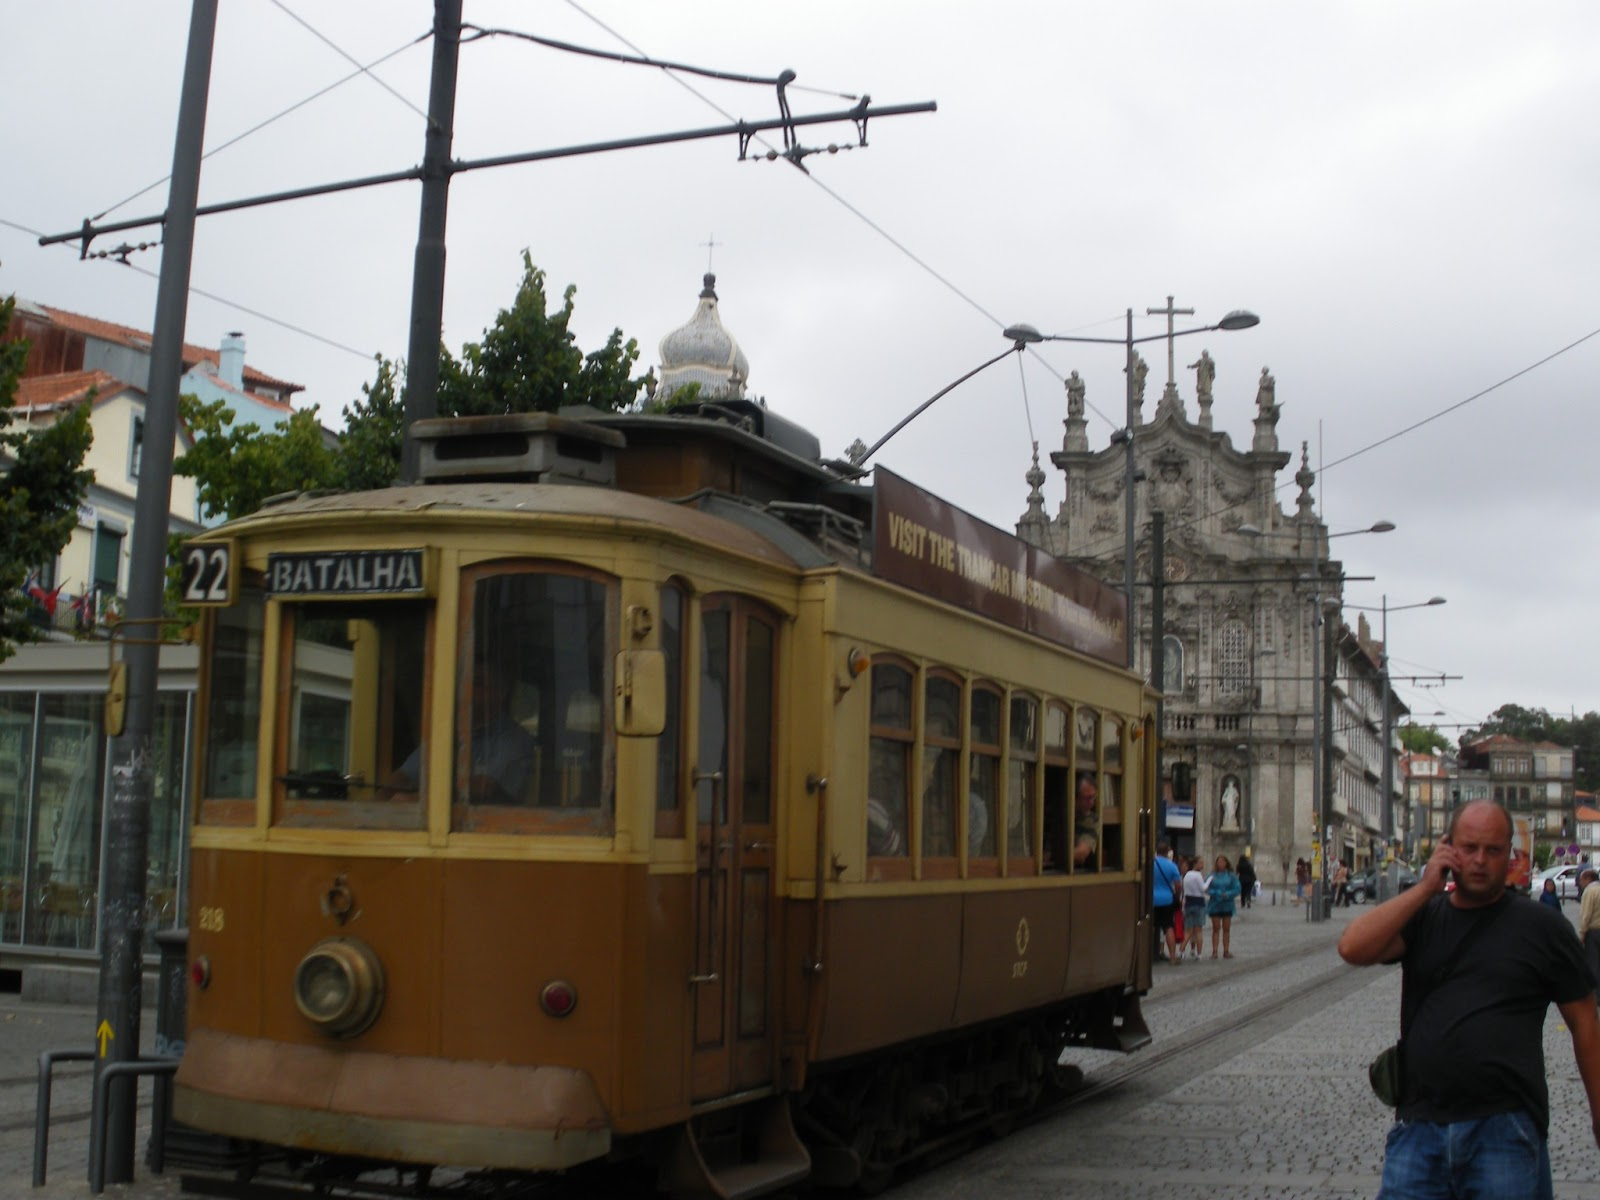 Las estrellas del camino el camino portugu s oporto for Oficina turismo oporto